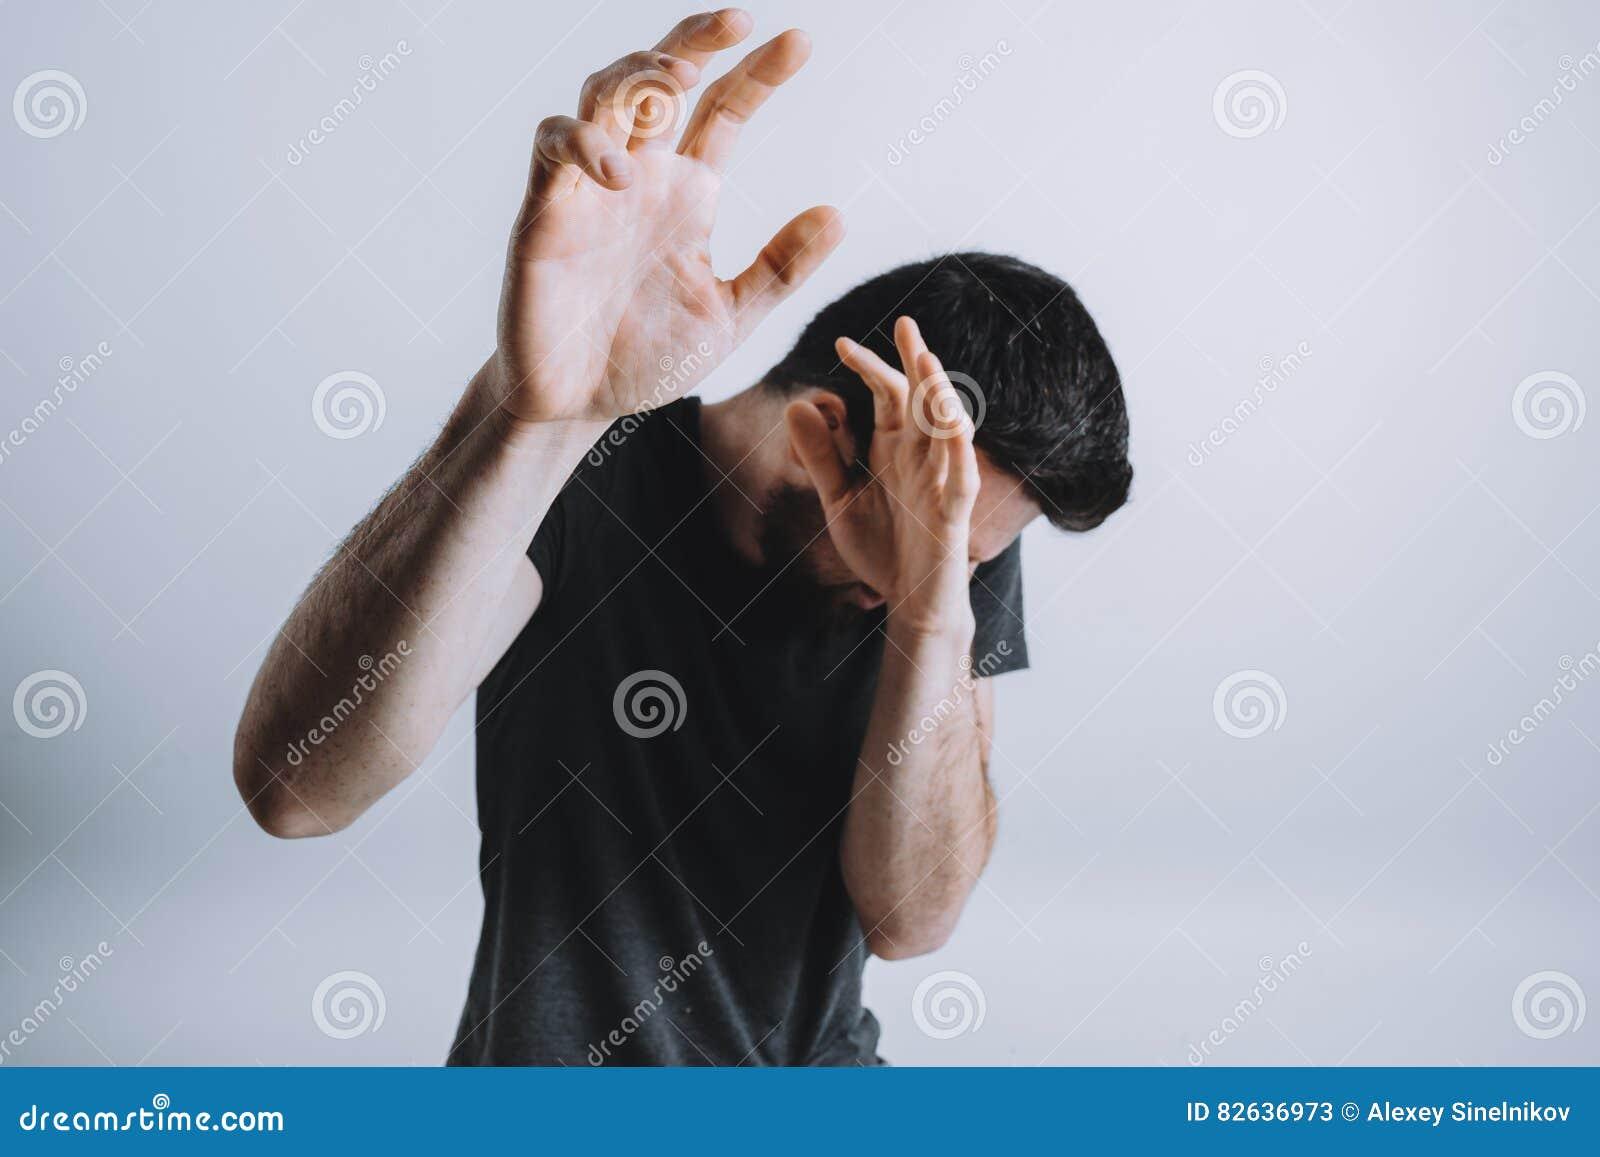 Black white abusing himself